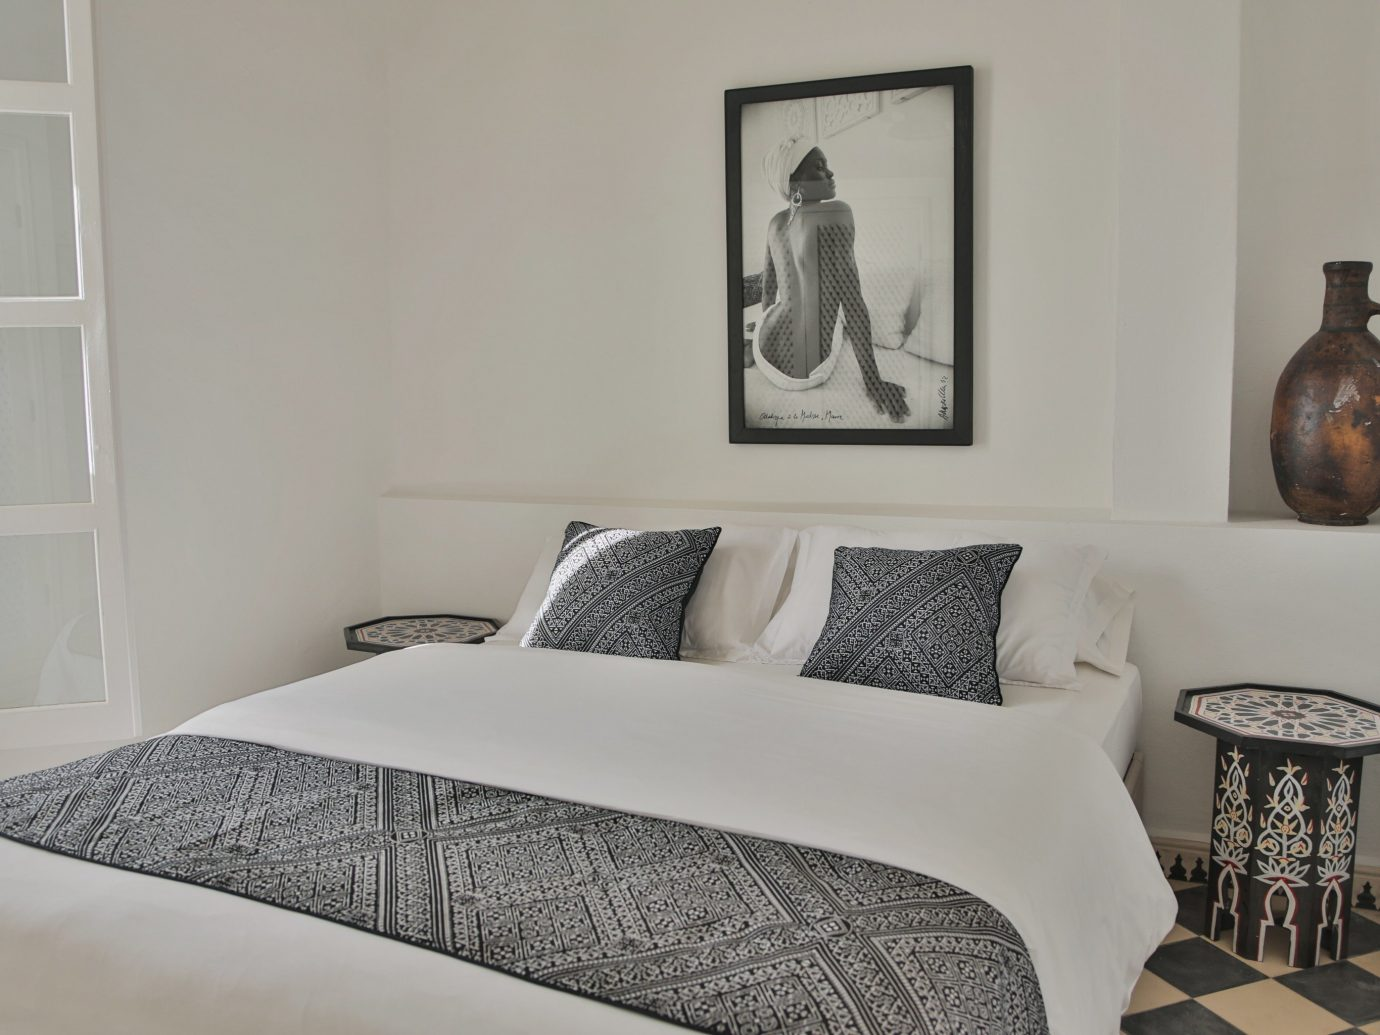 Hotels wall indoor room Bedroom property furniture bed interior design floor pillow home cottage bed frame bed sheet Design apartment decorated